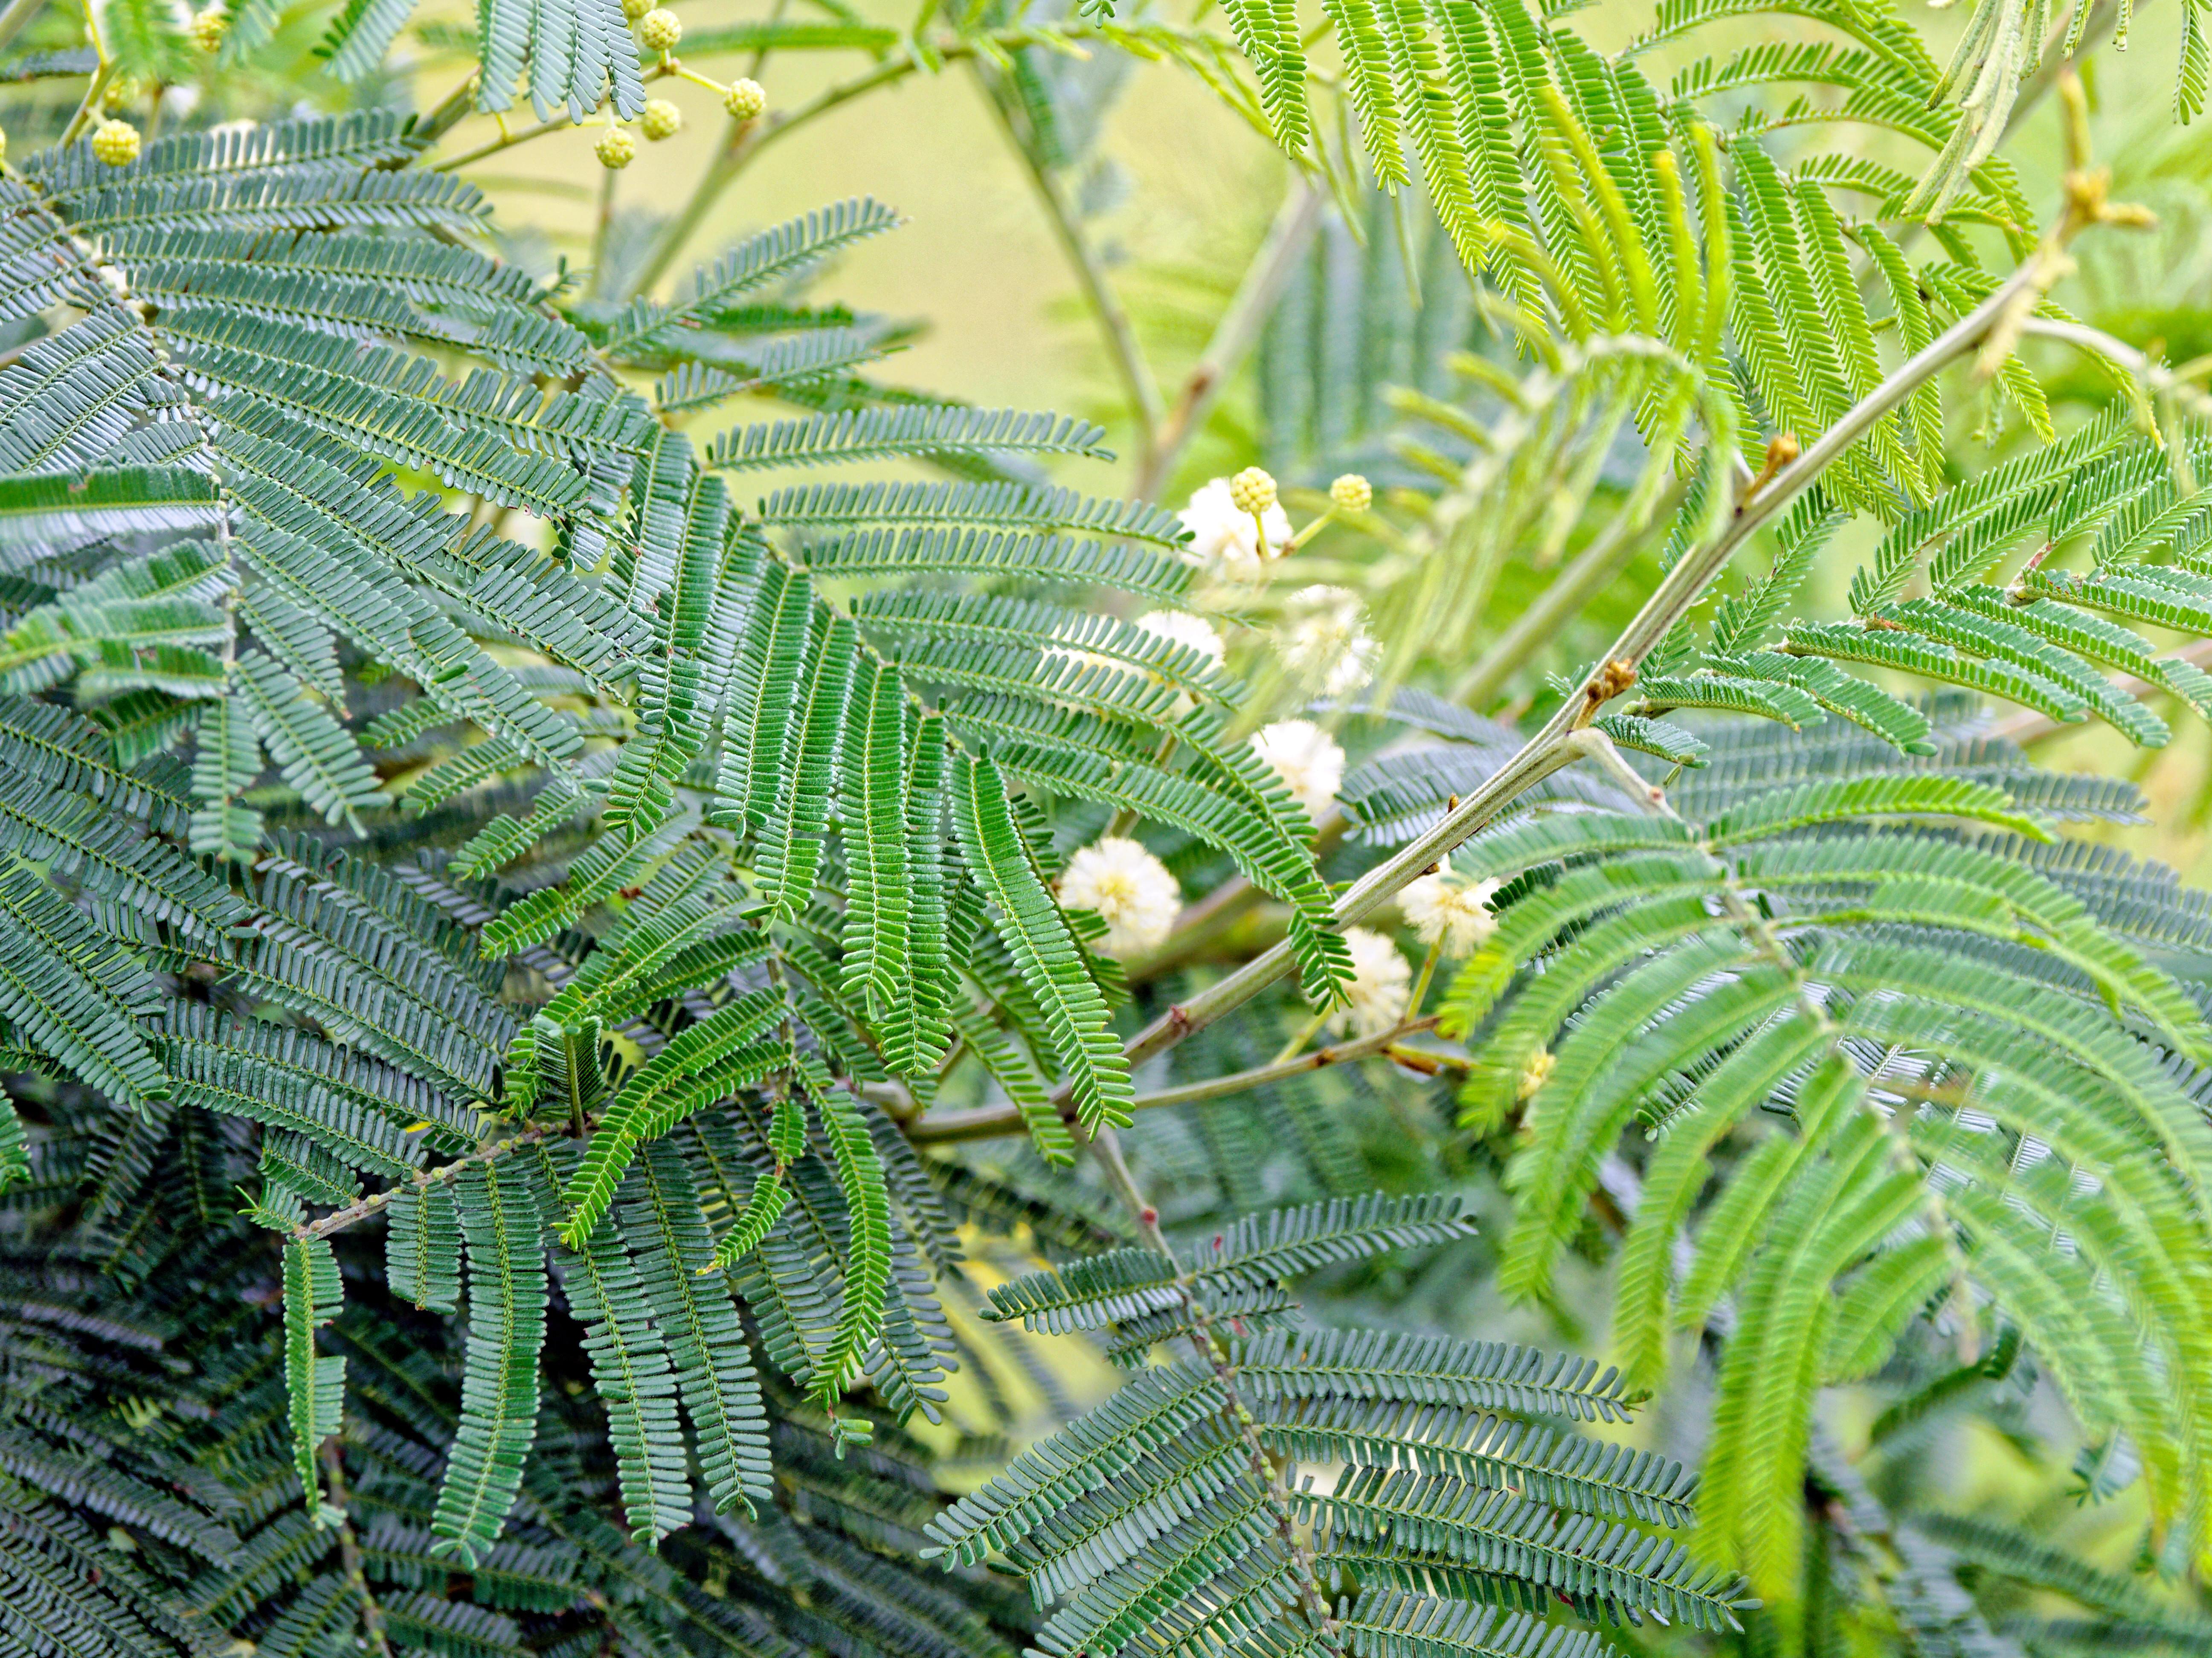 This should be Acacia-melanoxylon-4.jpeg.  Is it missing?